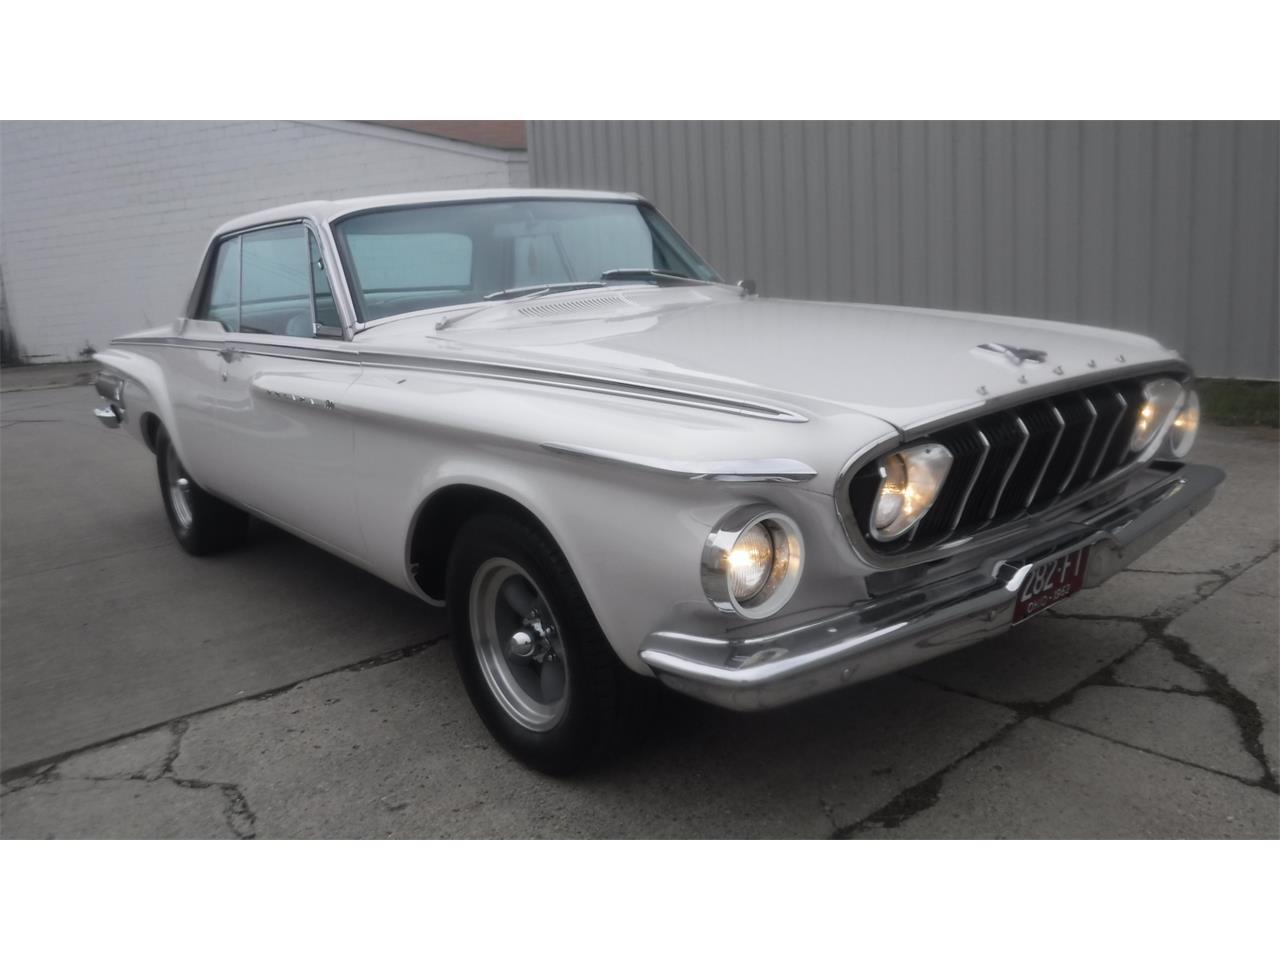 1962 Dodge Polara (CC-1417208) for sale in MILFORD, Ohio